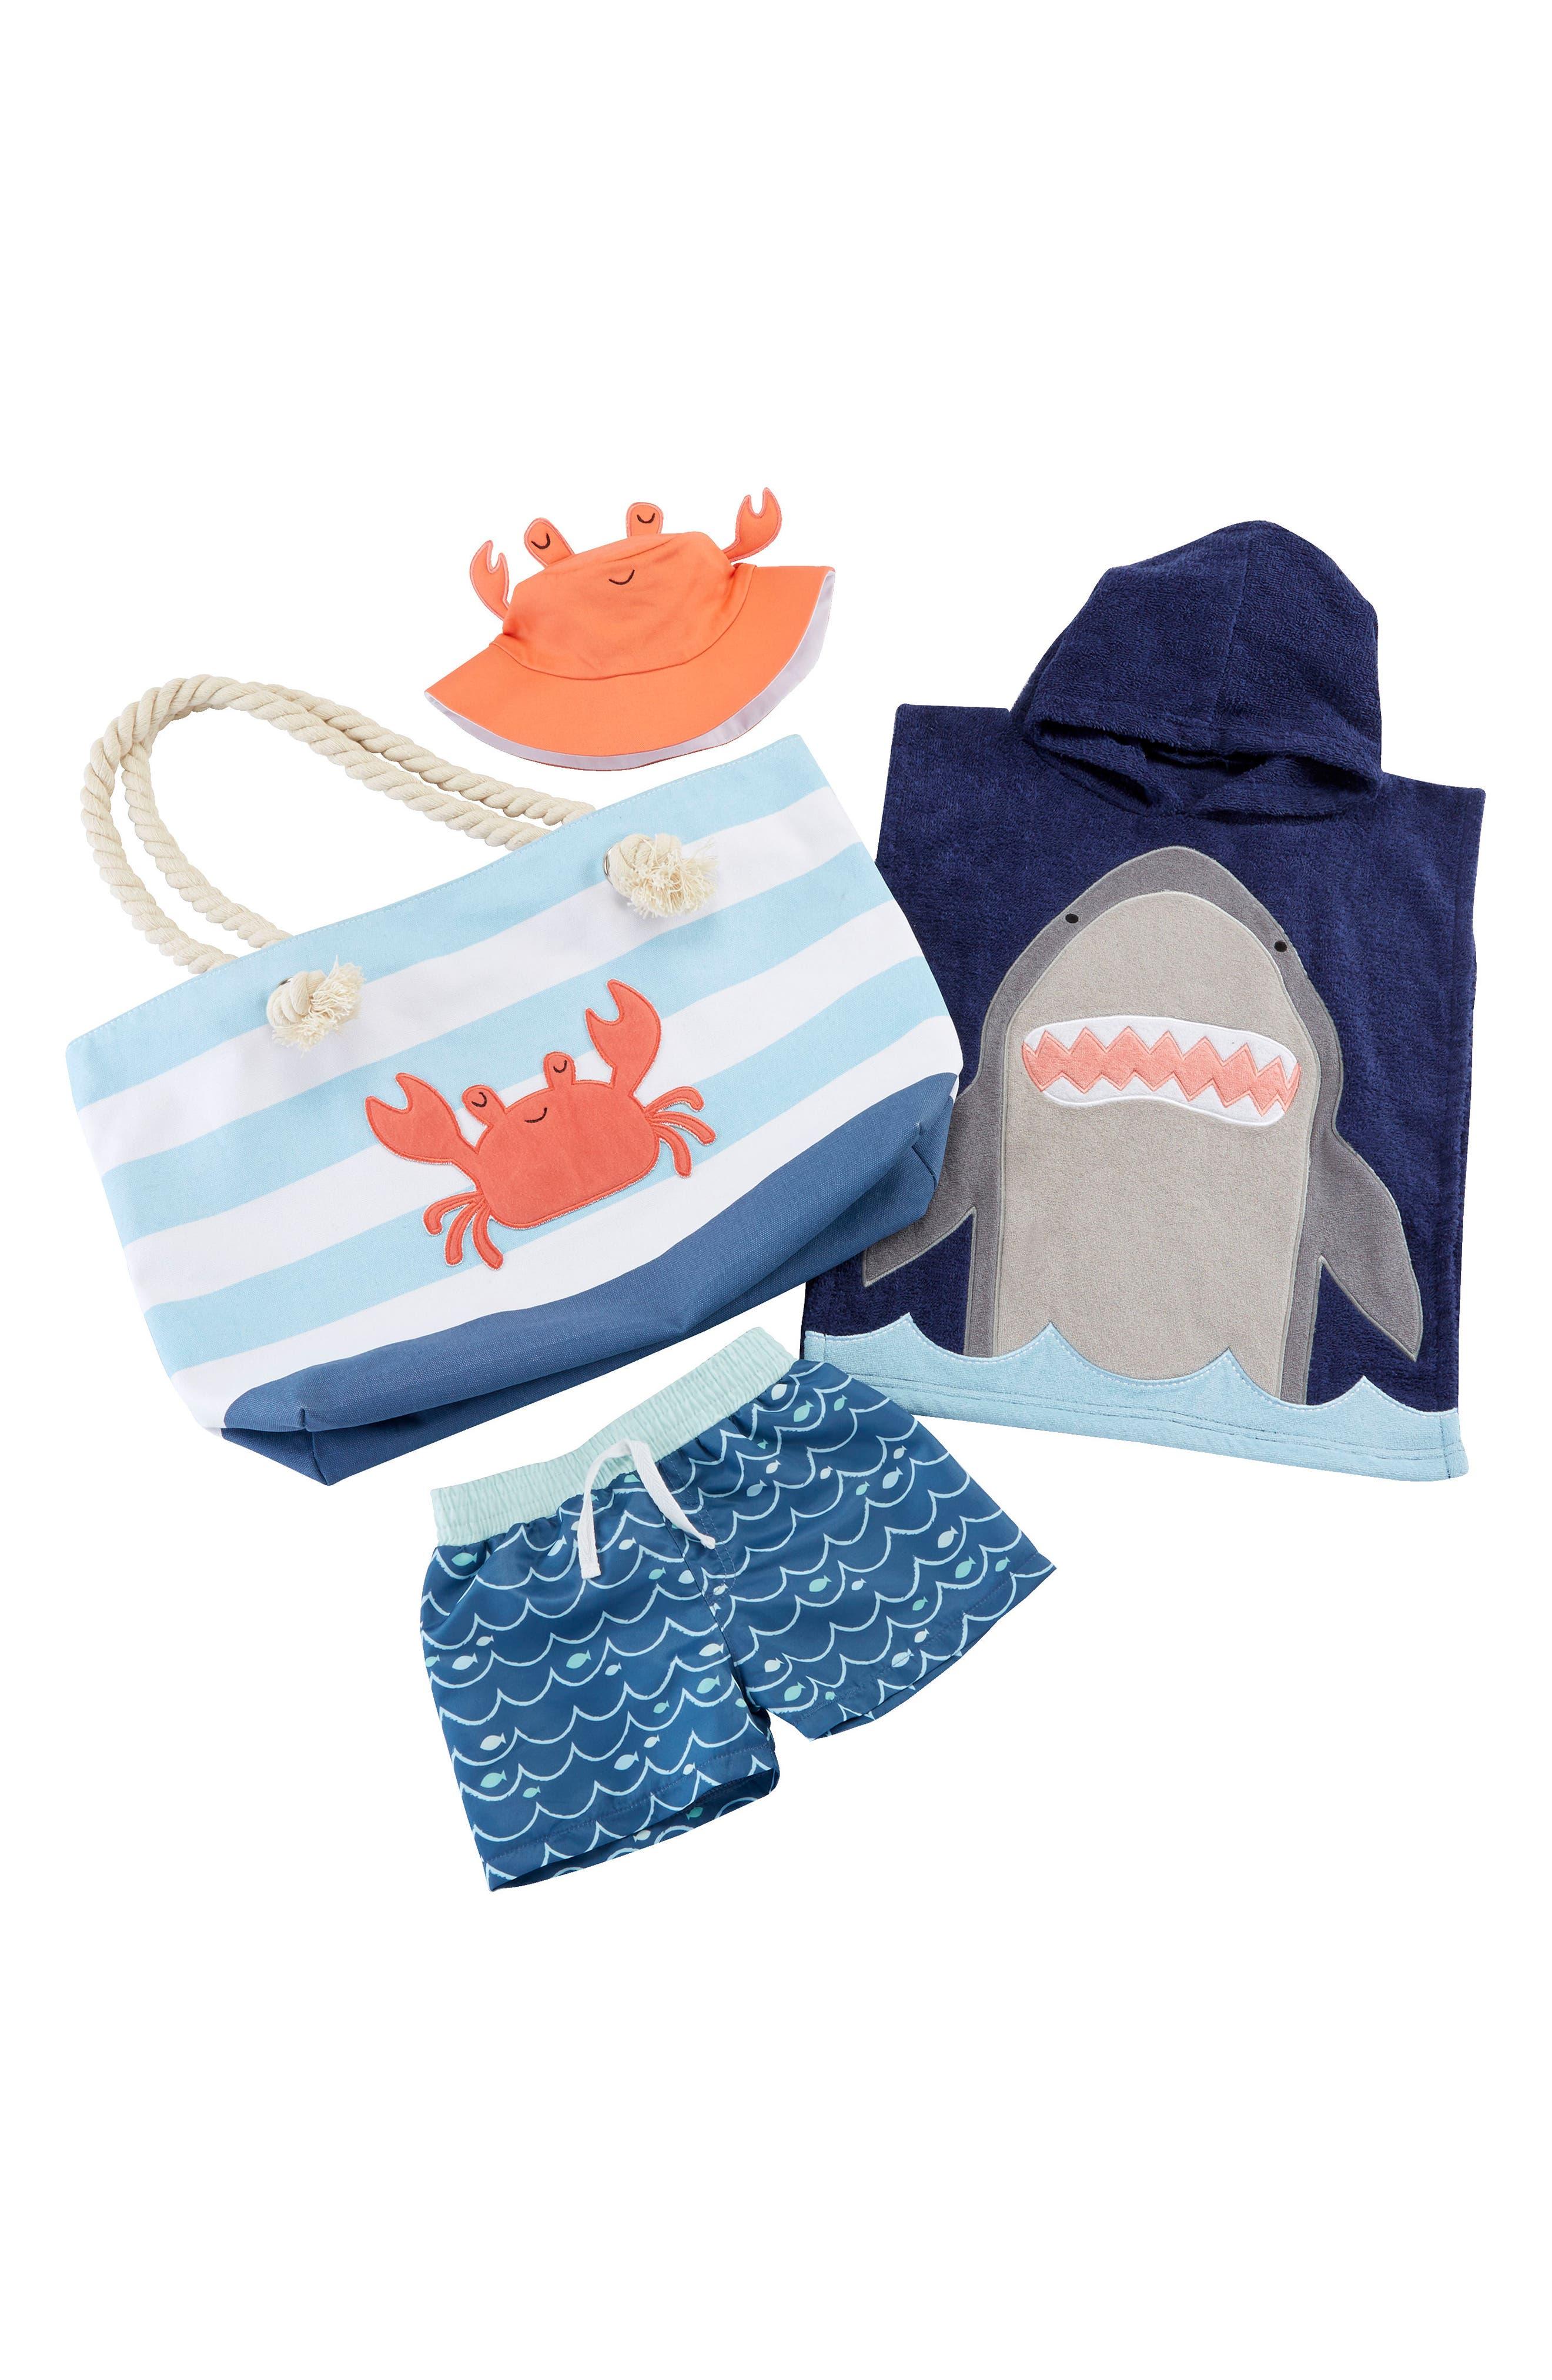 BABY ASPEN,                             Shark Hooded Towel, Swim Trunks, Sun Hat & Tote Set,                             Main thumbnail 1, color,                             BLUE